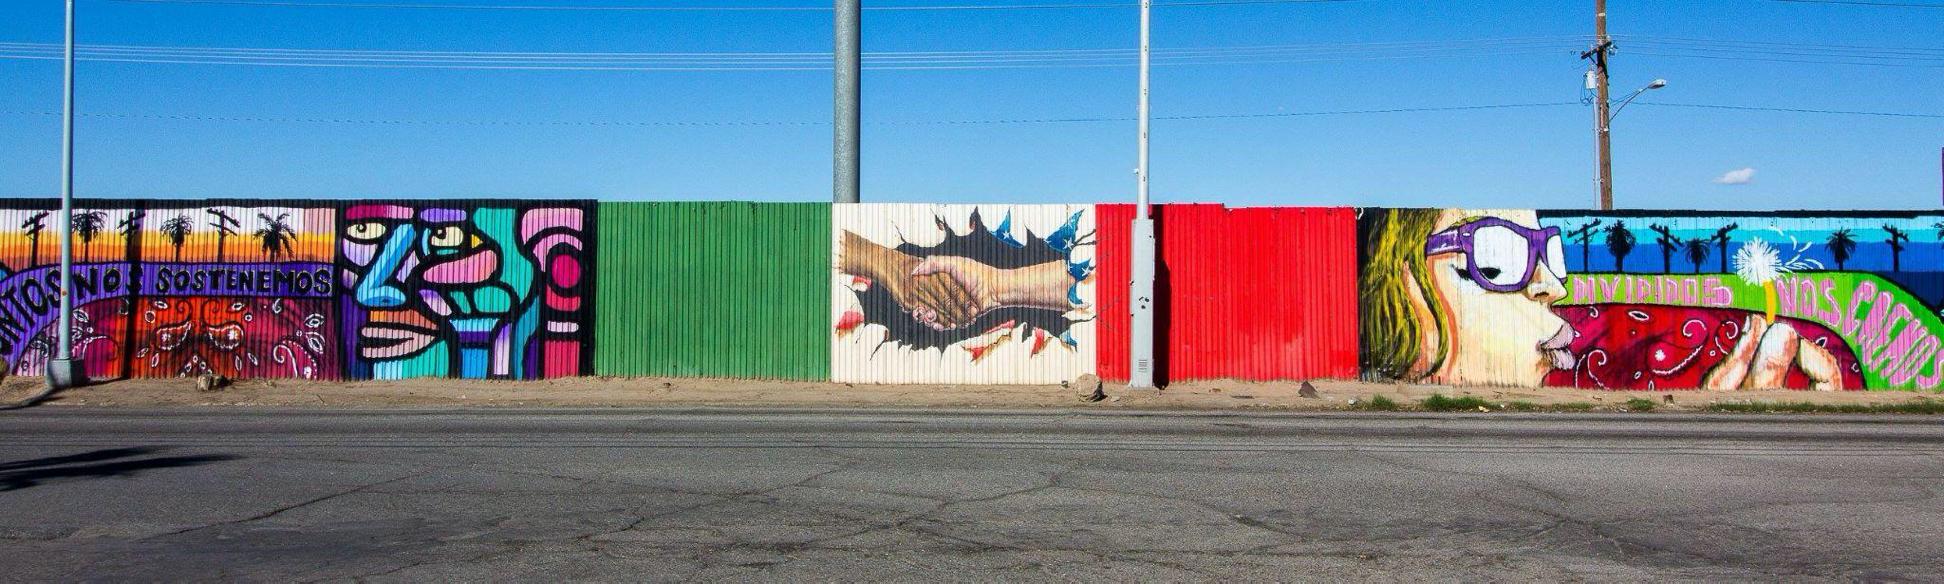 Opinion: I celebrate those who made equal marriage a reality in Baja California